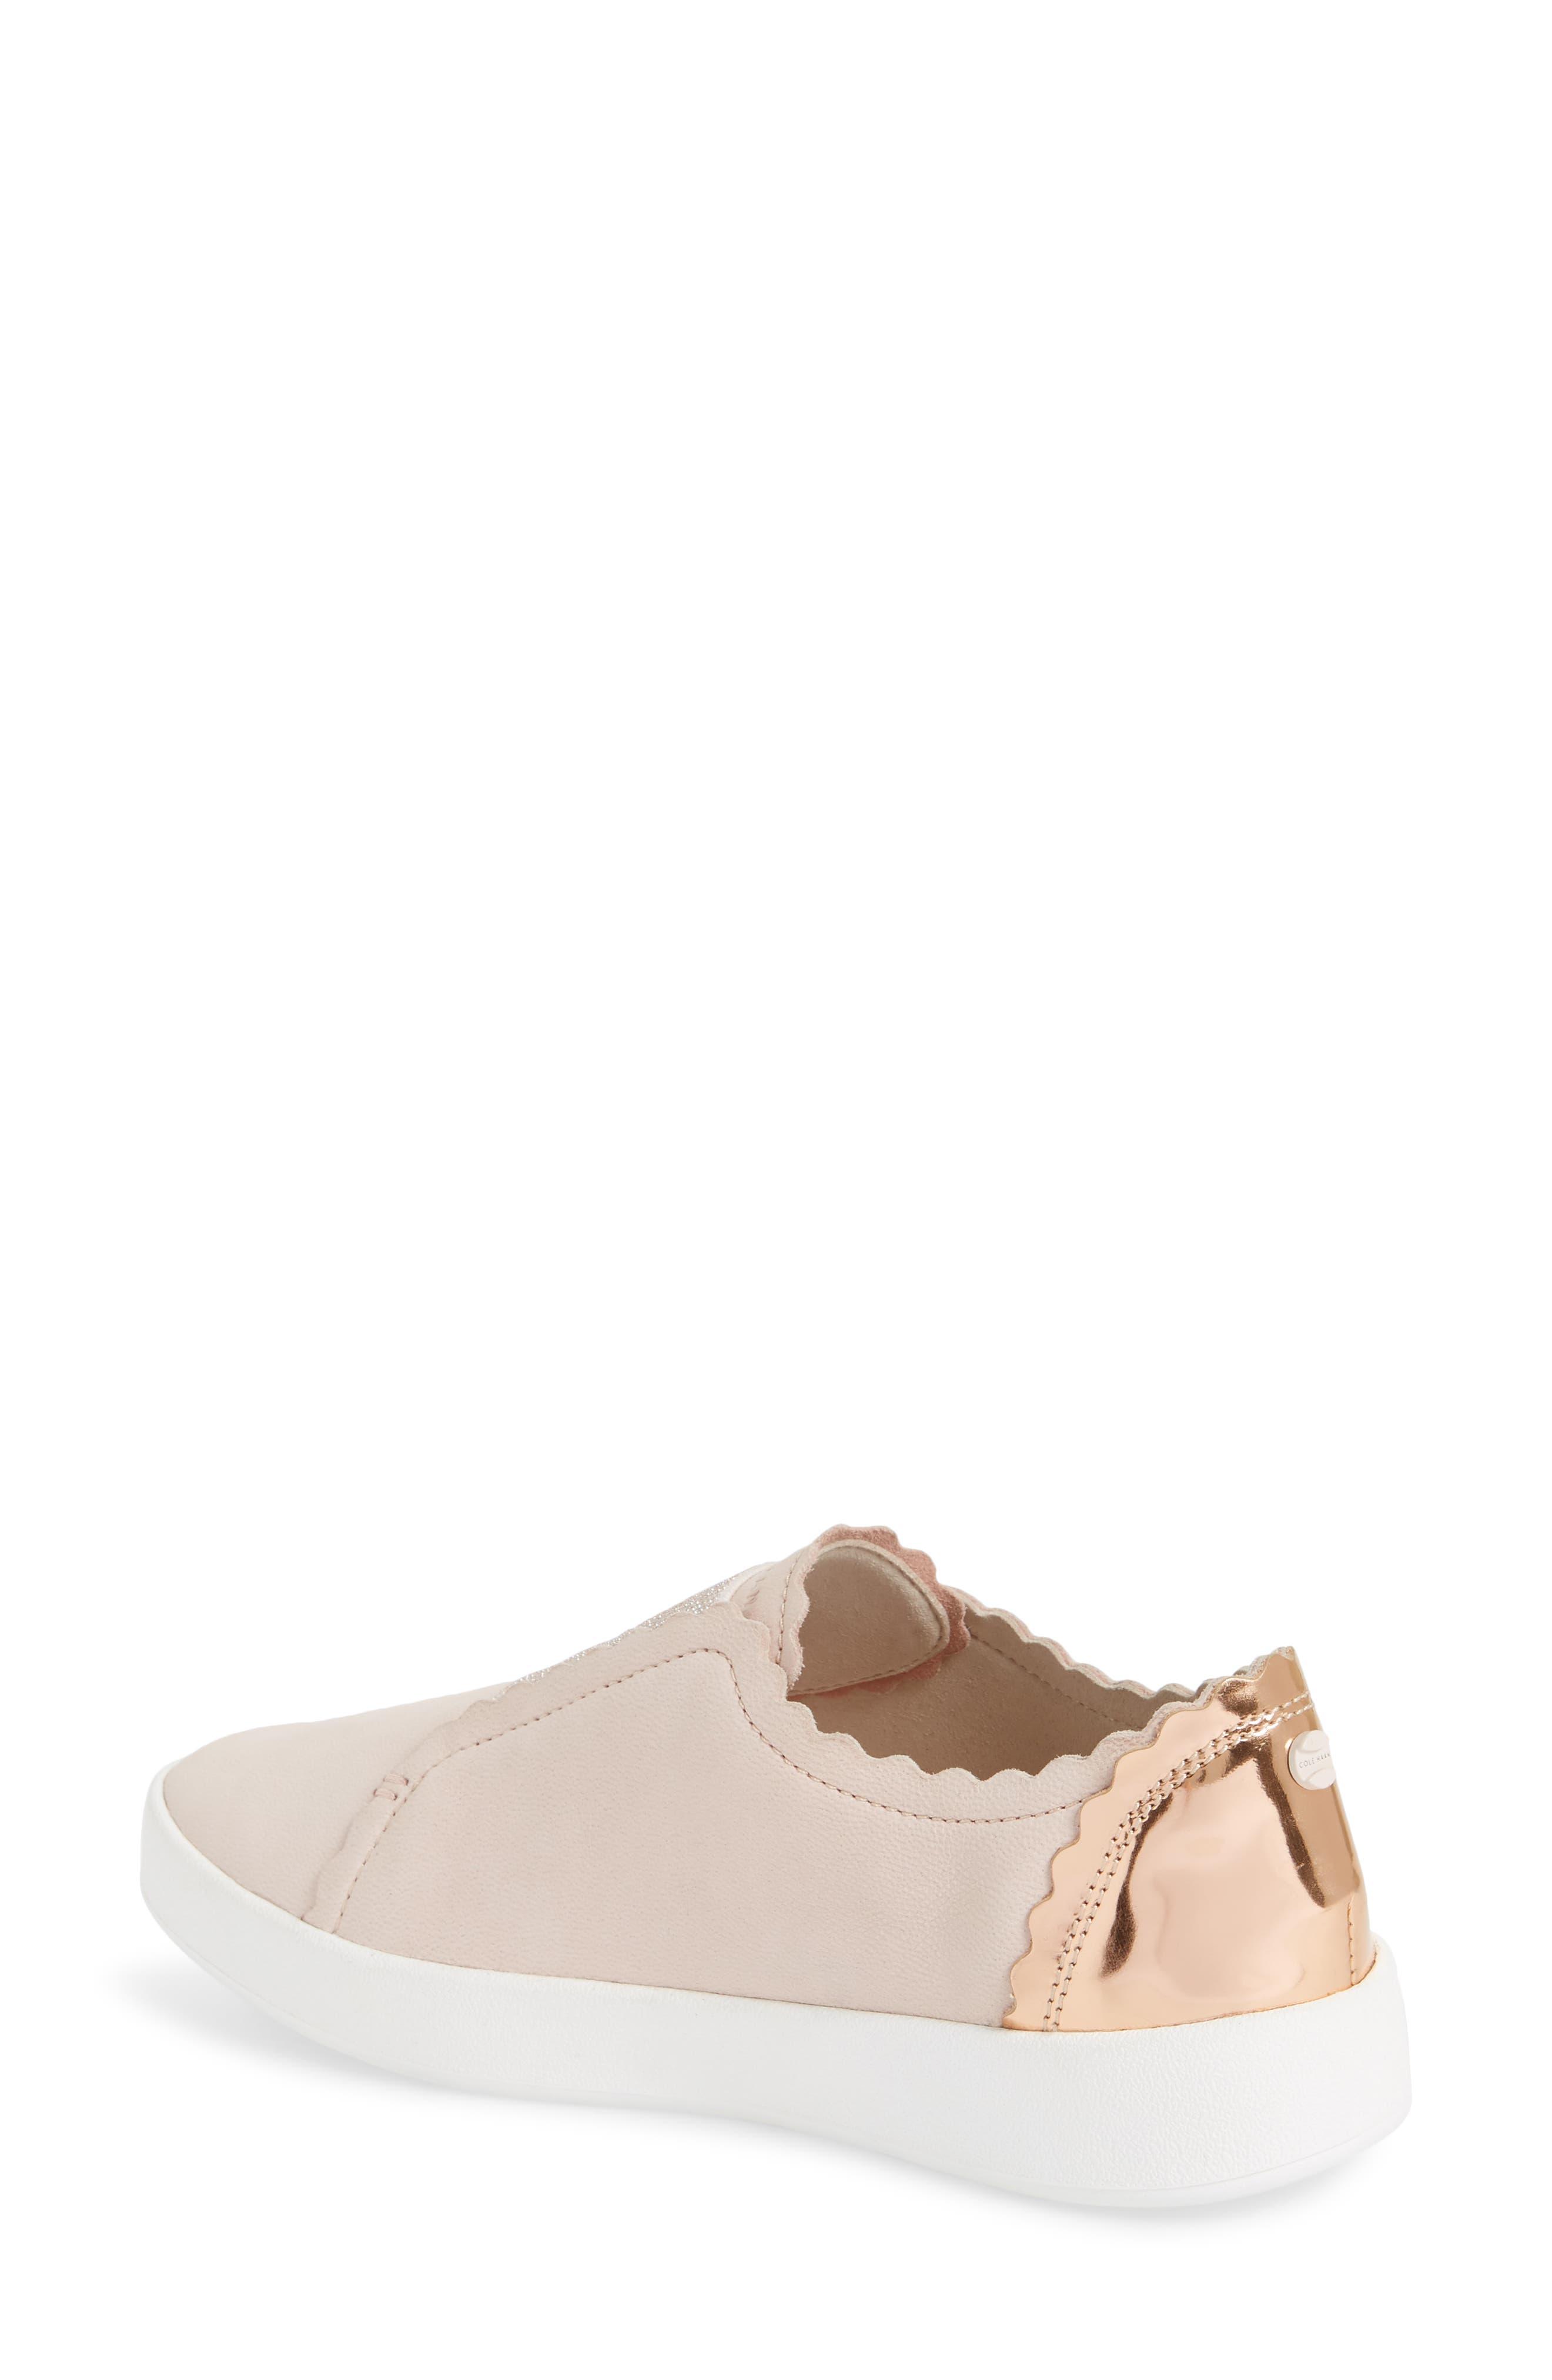 COLE HAAN, GrandPro Spectator Scalloped Slip-On Sneaker, Alternate thumbnail 2, color, PEACH BLUSH NUBUCK